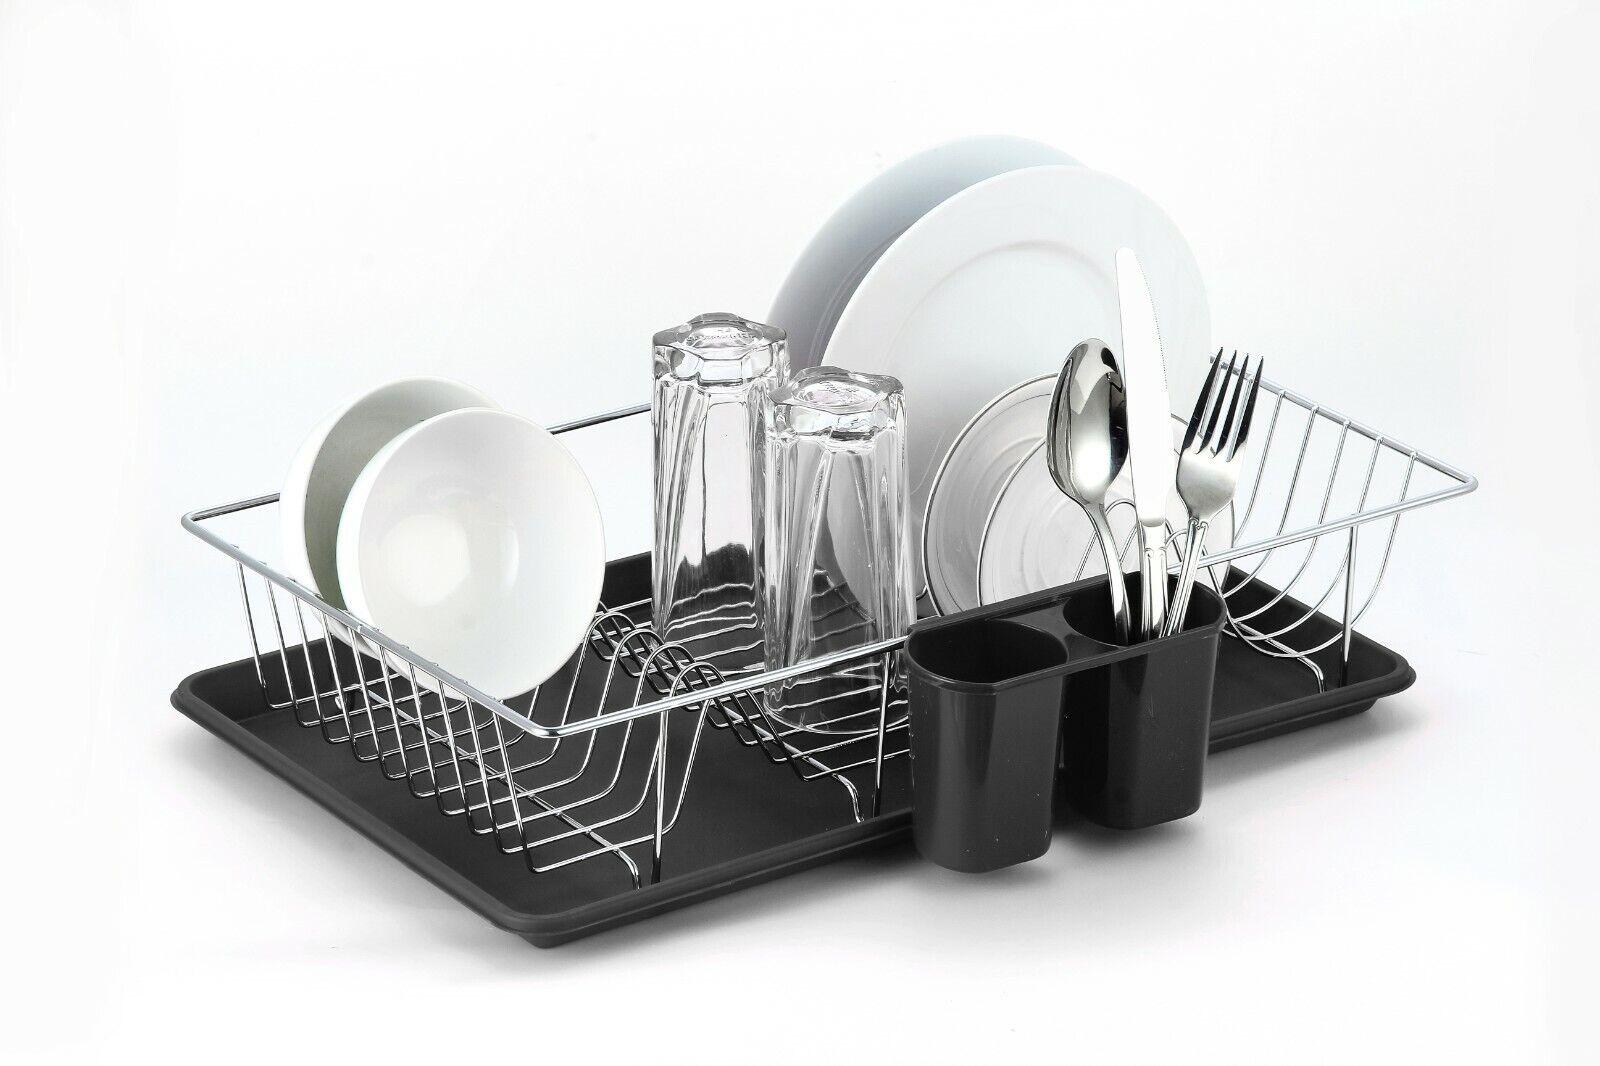 Stainless Steel Dish Rack Dish Drying Rack Kitchen Holder